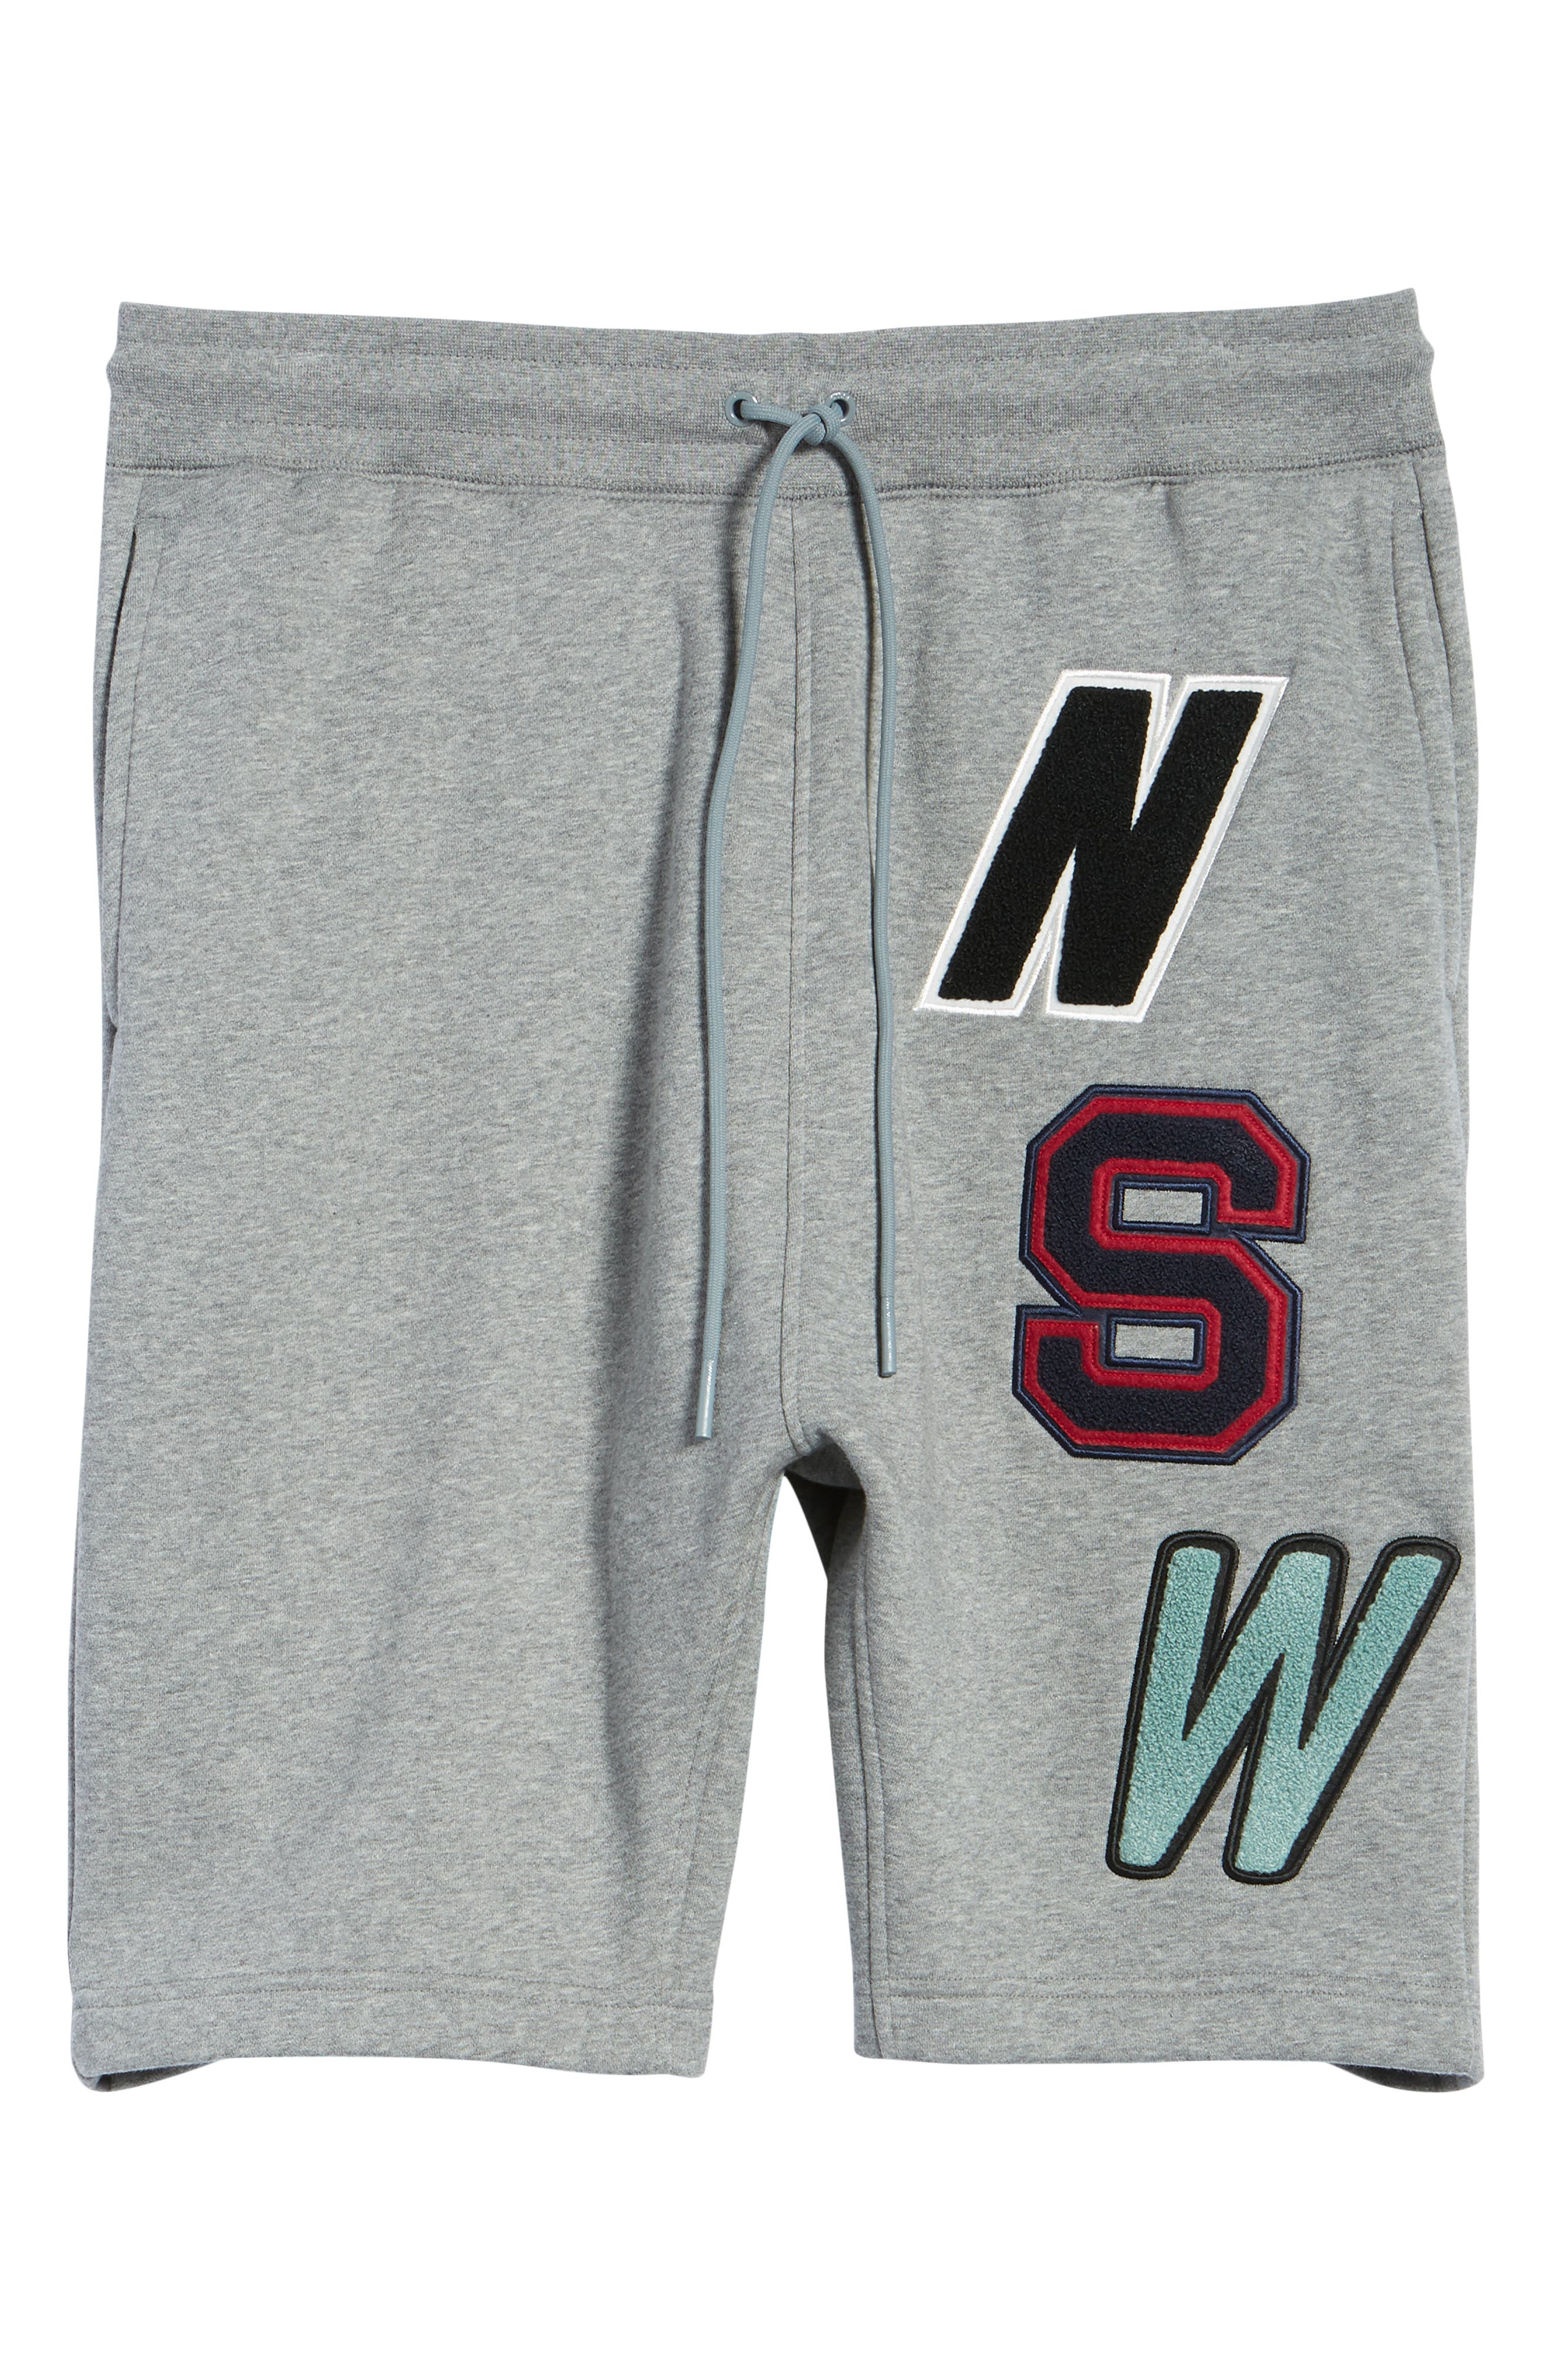 NSW Fleece Shorts,                             Alternate thumbnail 6, color,                             091